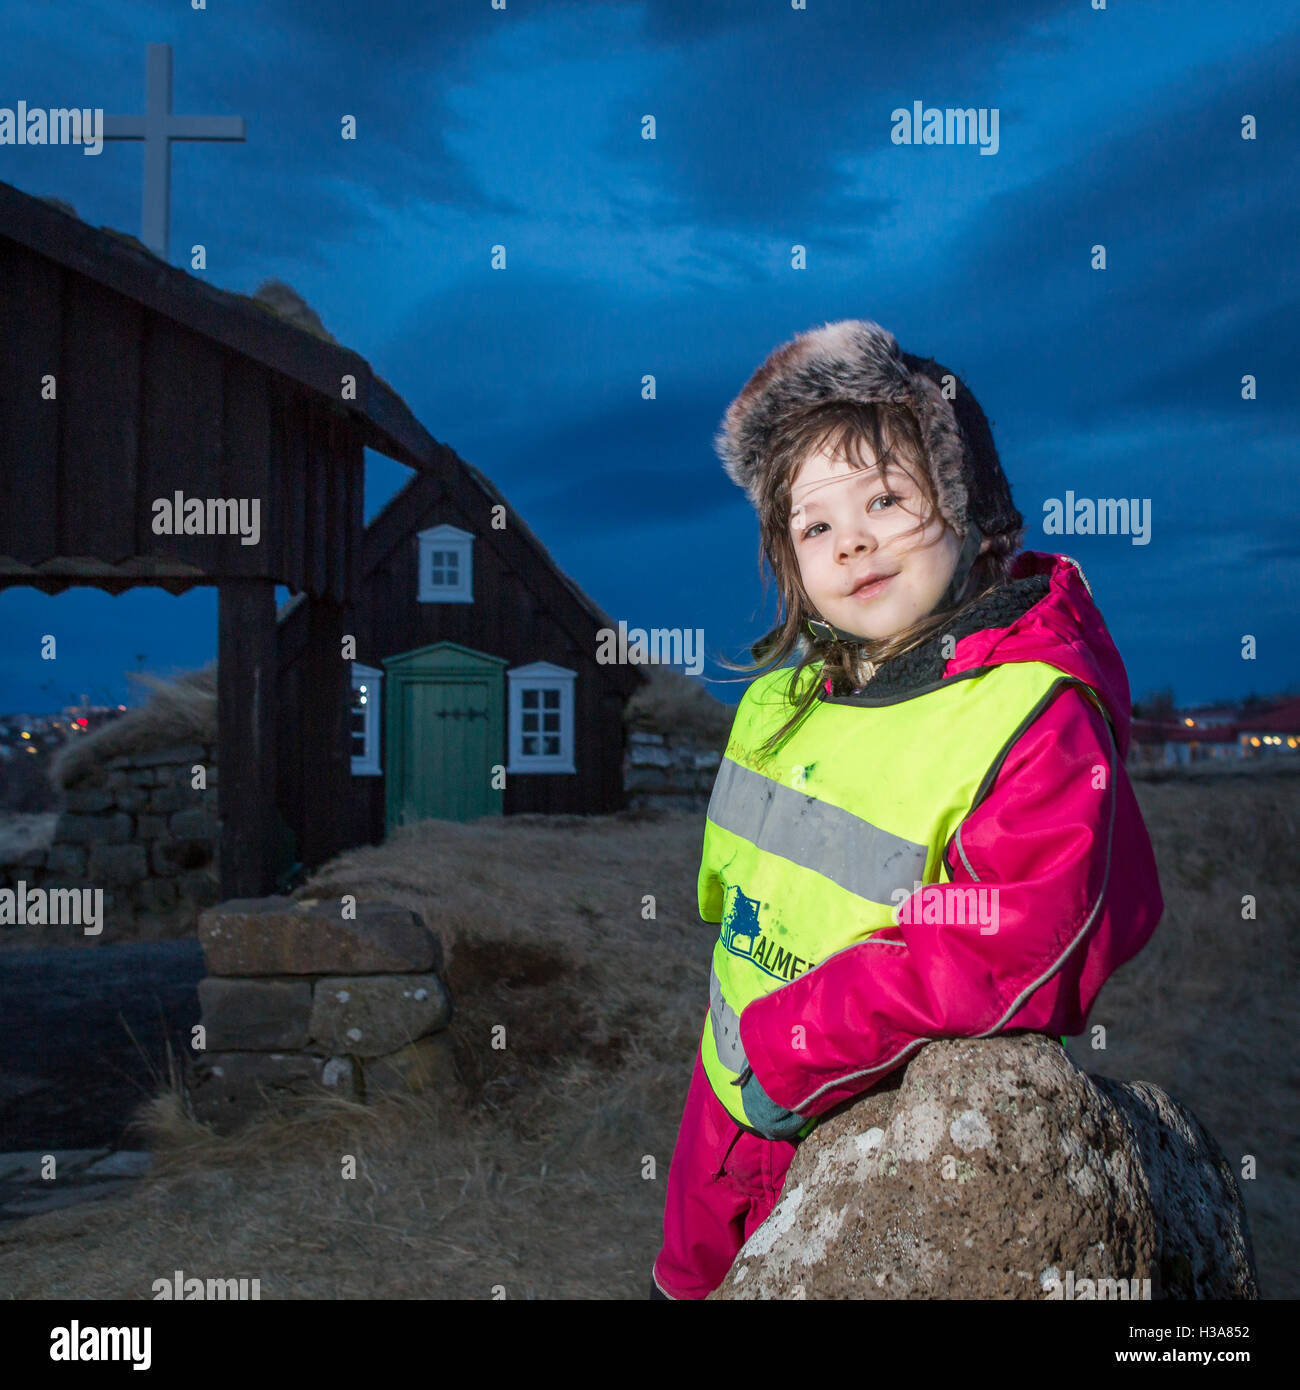 Giovane ragazza in età prescolare visitando il Museo Arbaejarsafn, Reykjavik, Islanda Immagini Stock